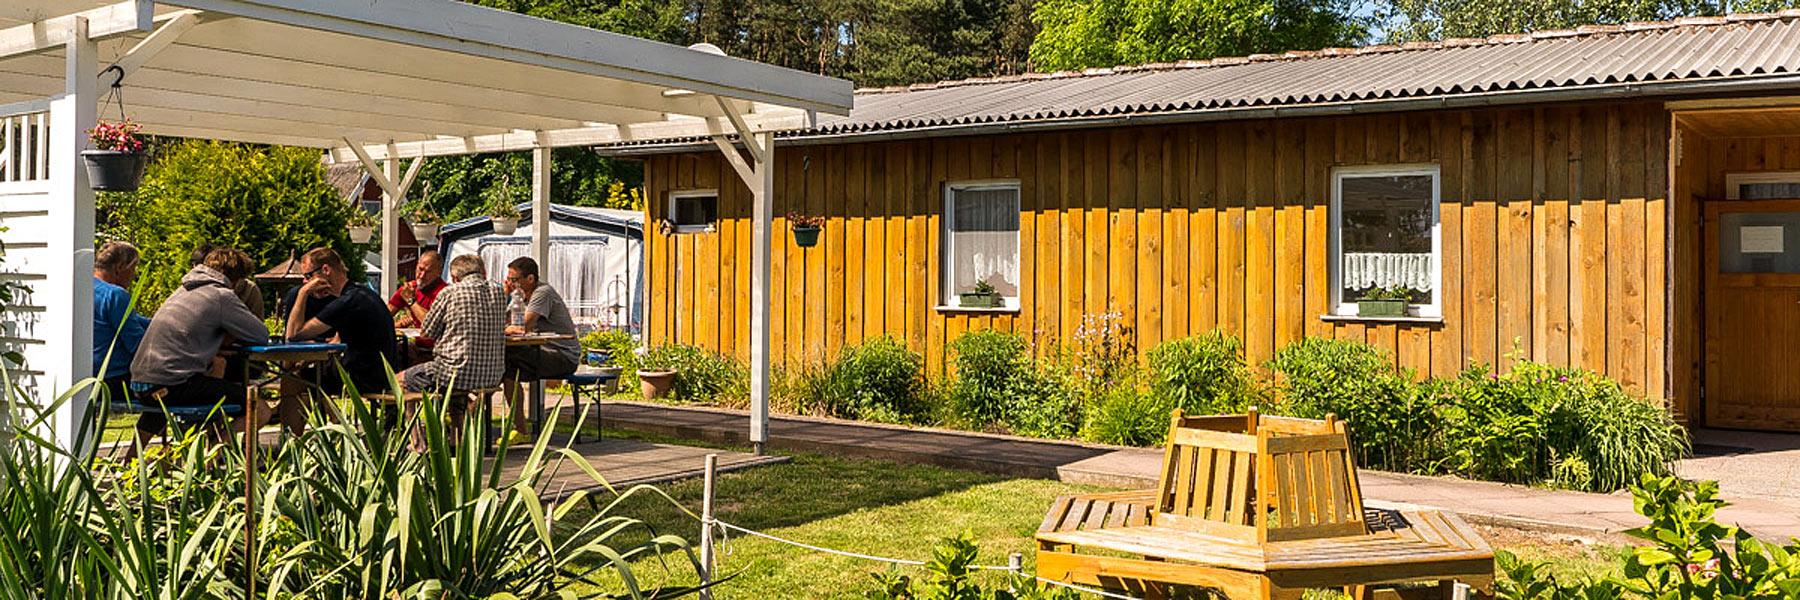 Bungalow - Campingplatz Stahlbrode